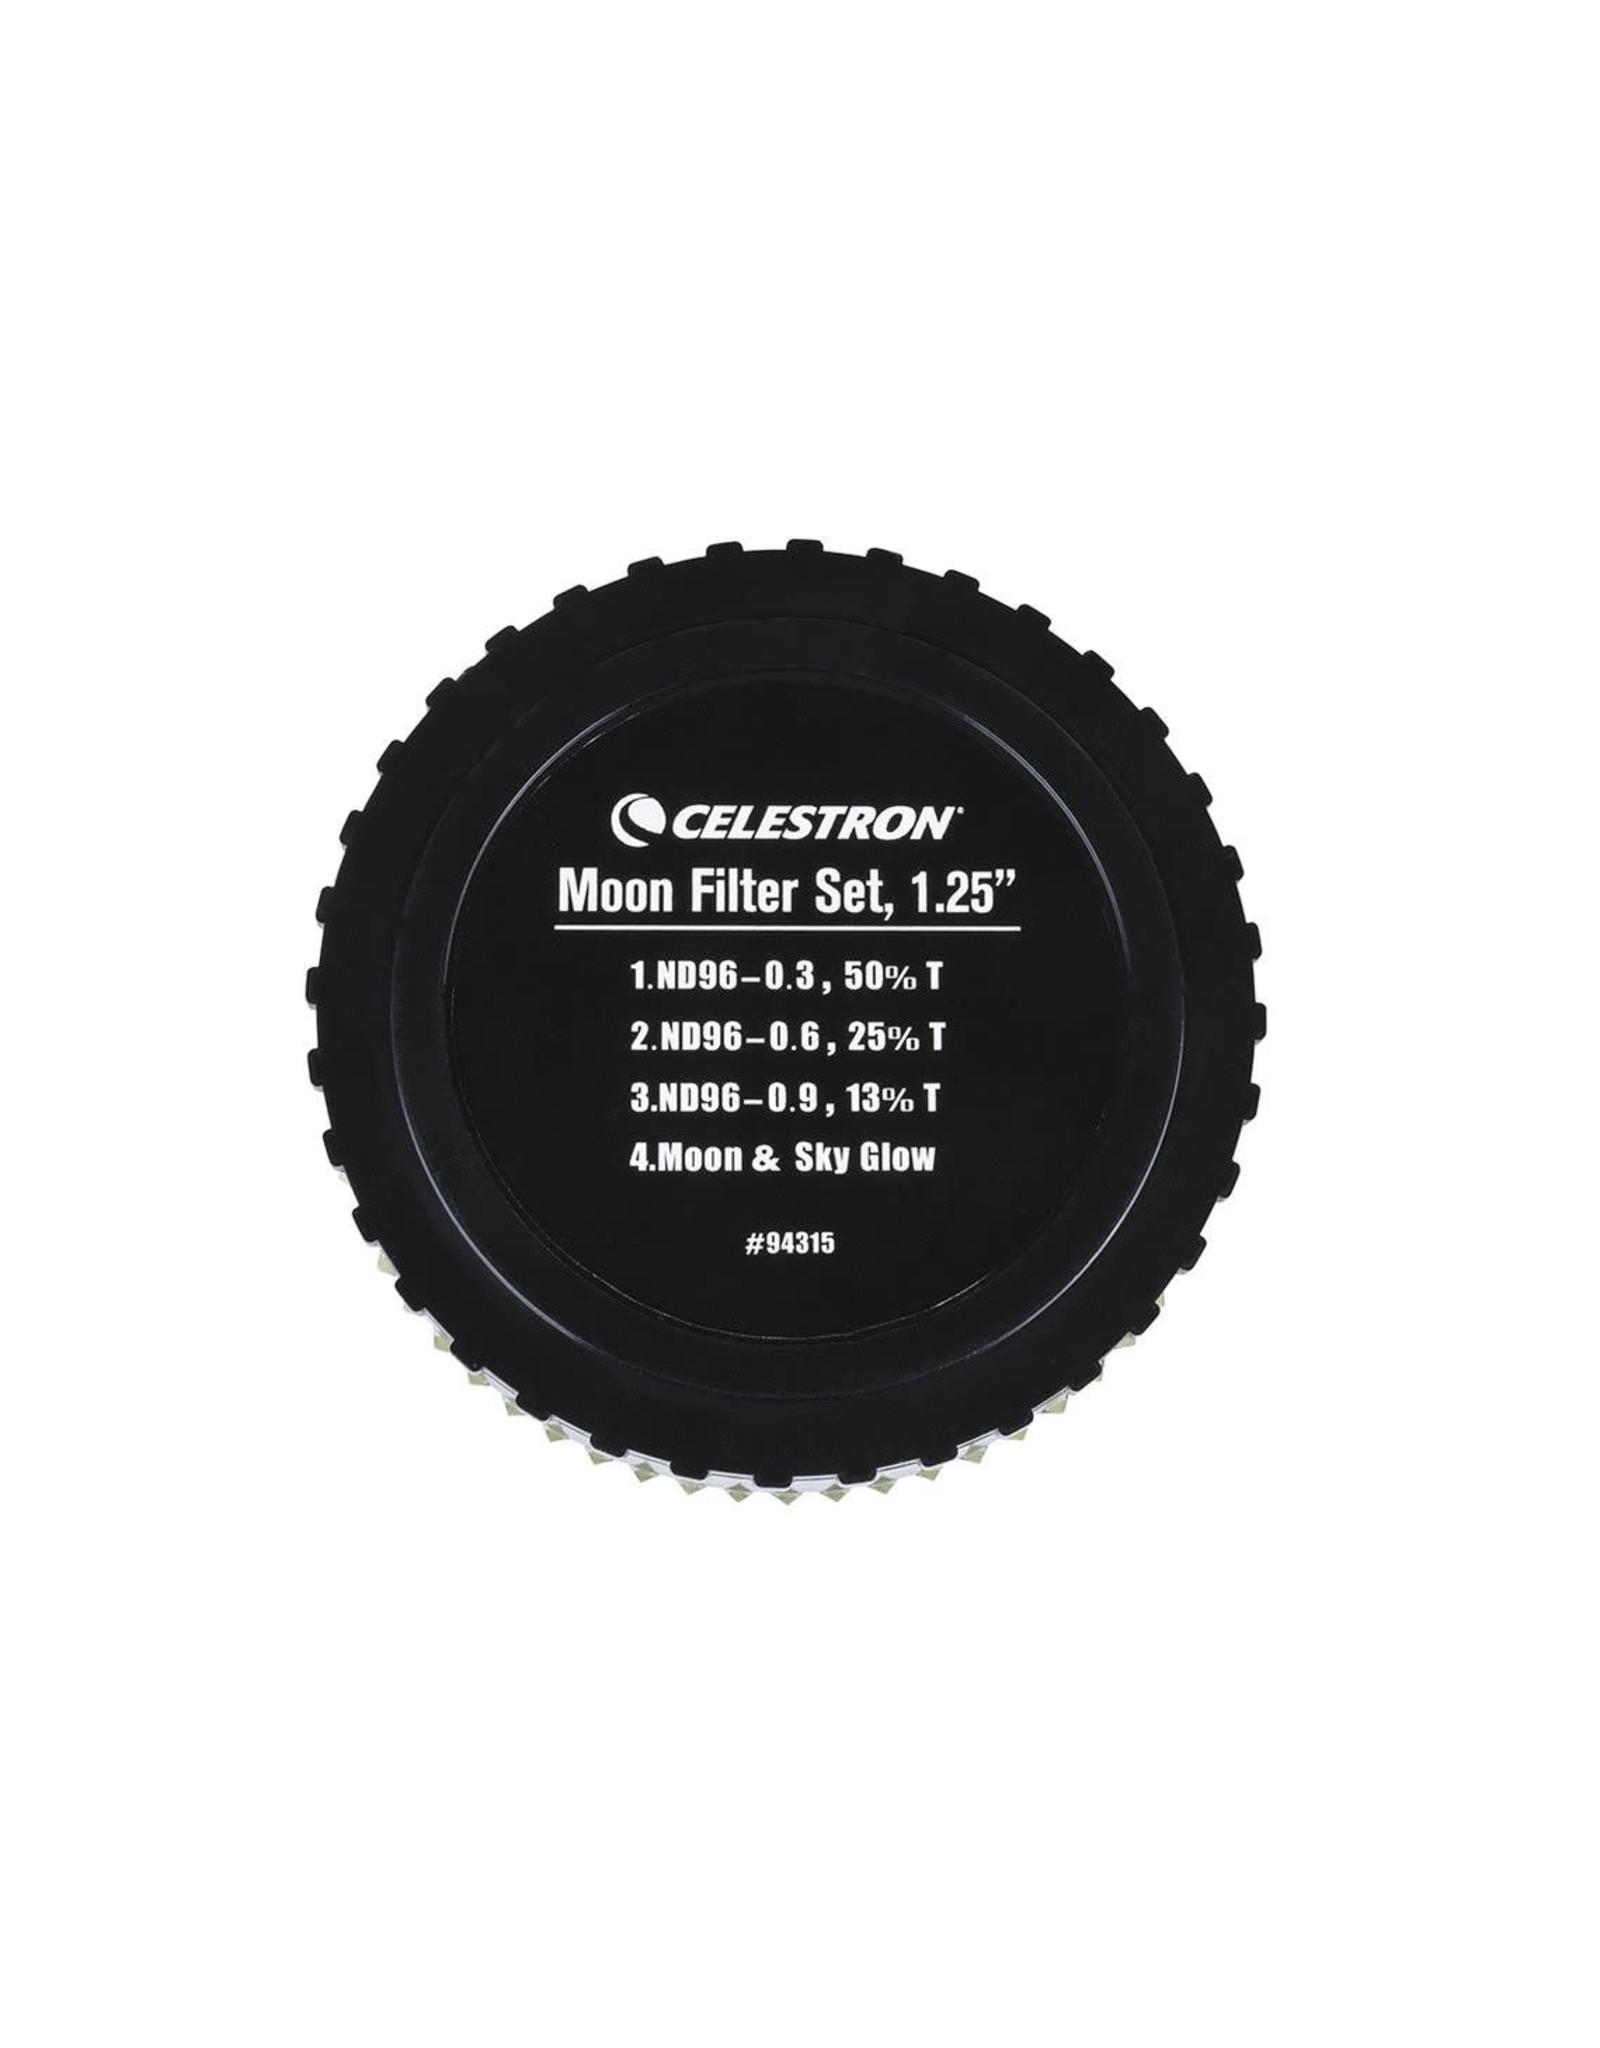 "Celestron Celestron Moon Filter Set 1.25"""